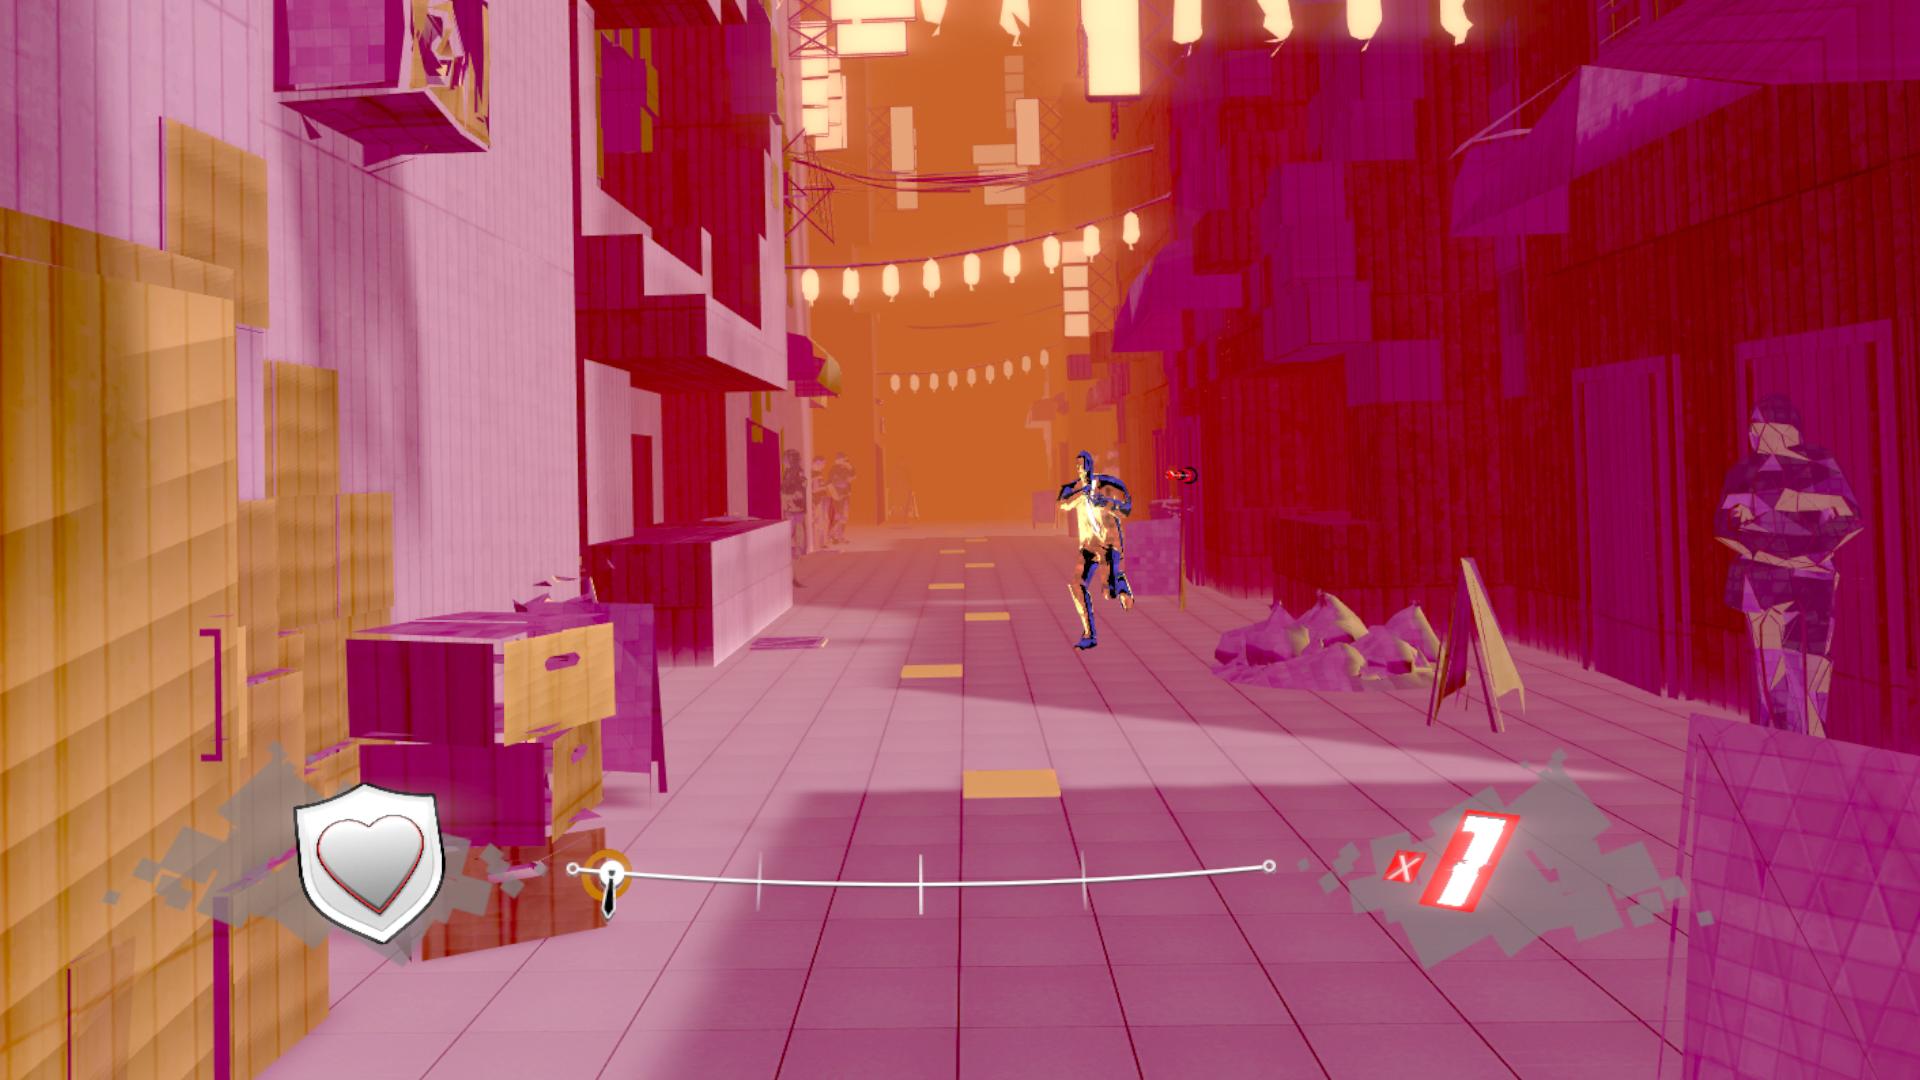 VRゲーム【Pistol Whip】を攻略するコツ